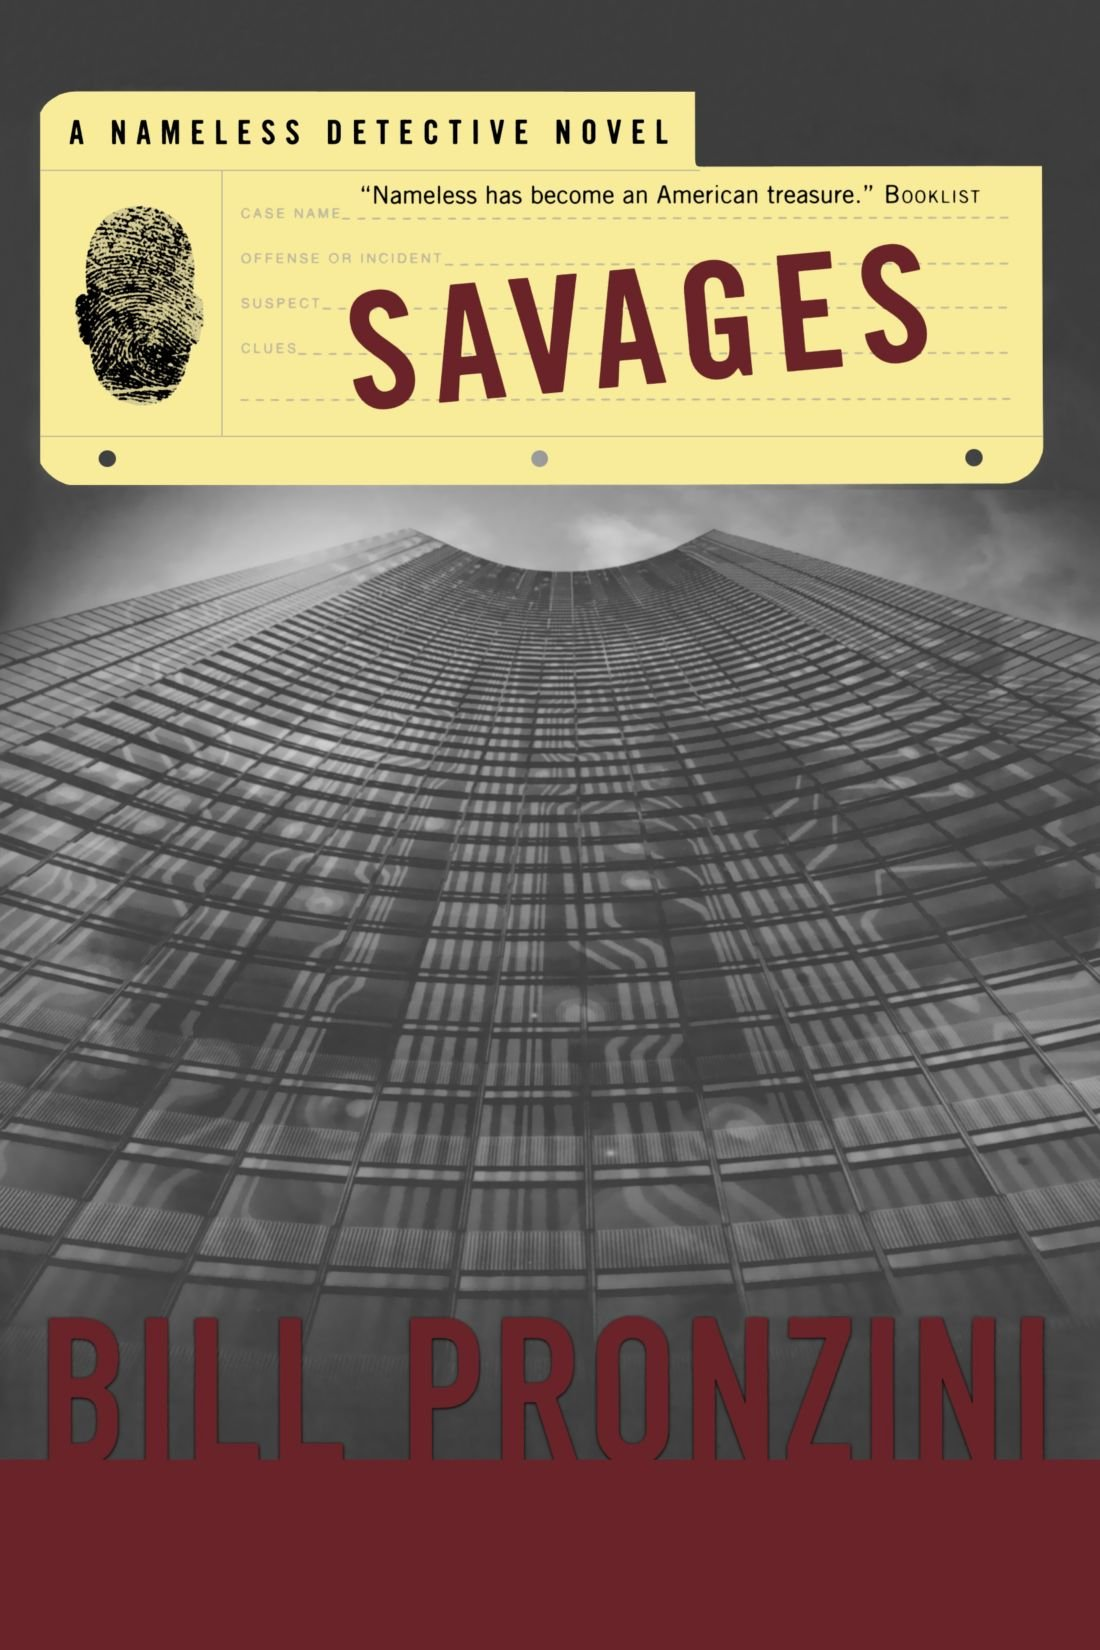 Savages: A Nameless Detective Novel (Nameless Detective Novels) pdf